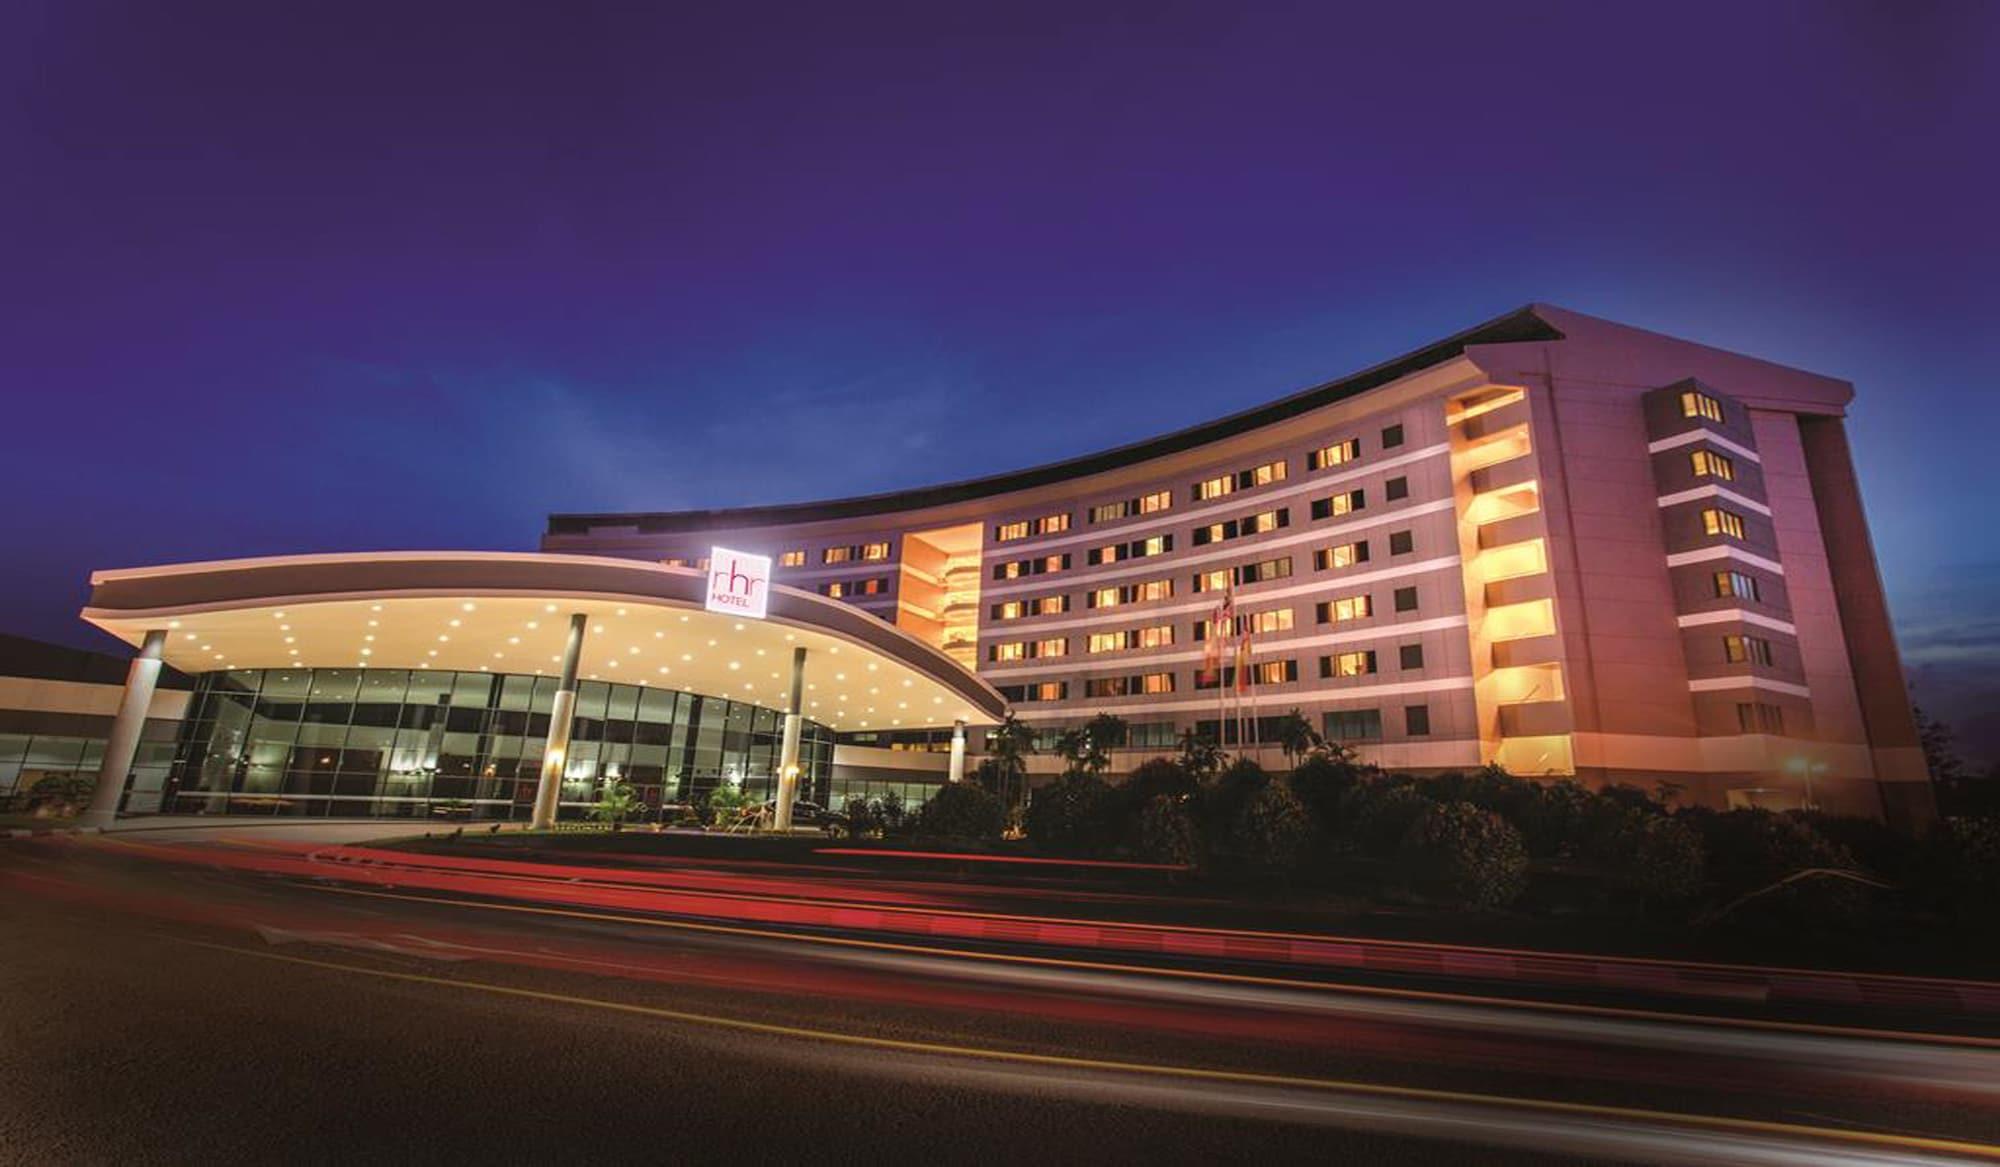 RHR Hotel @ Uniten, Kuala Lumpur